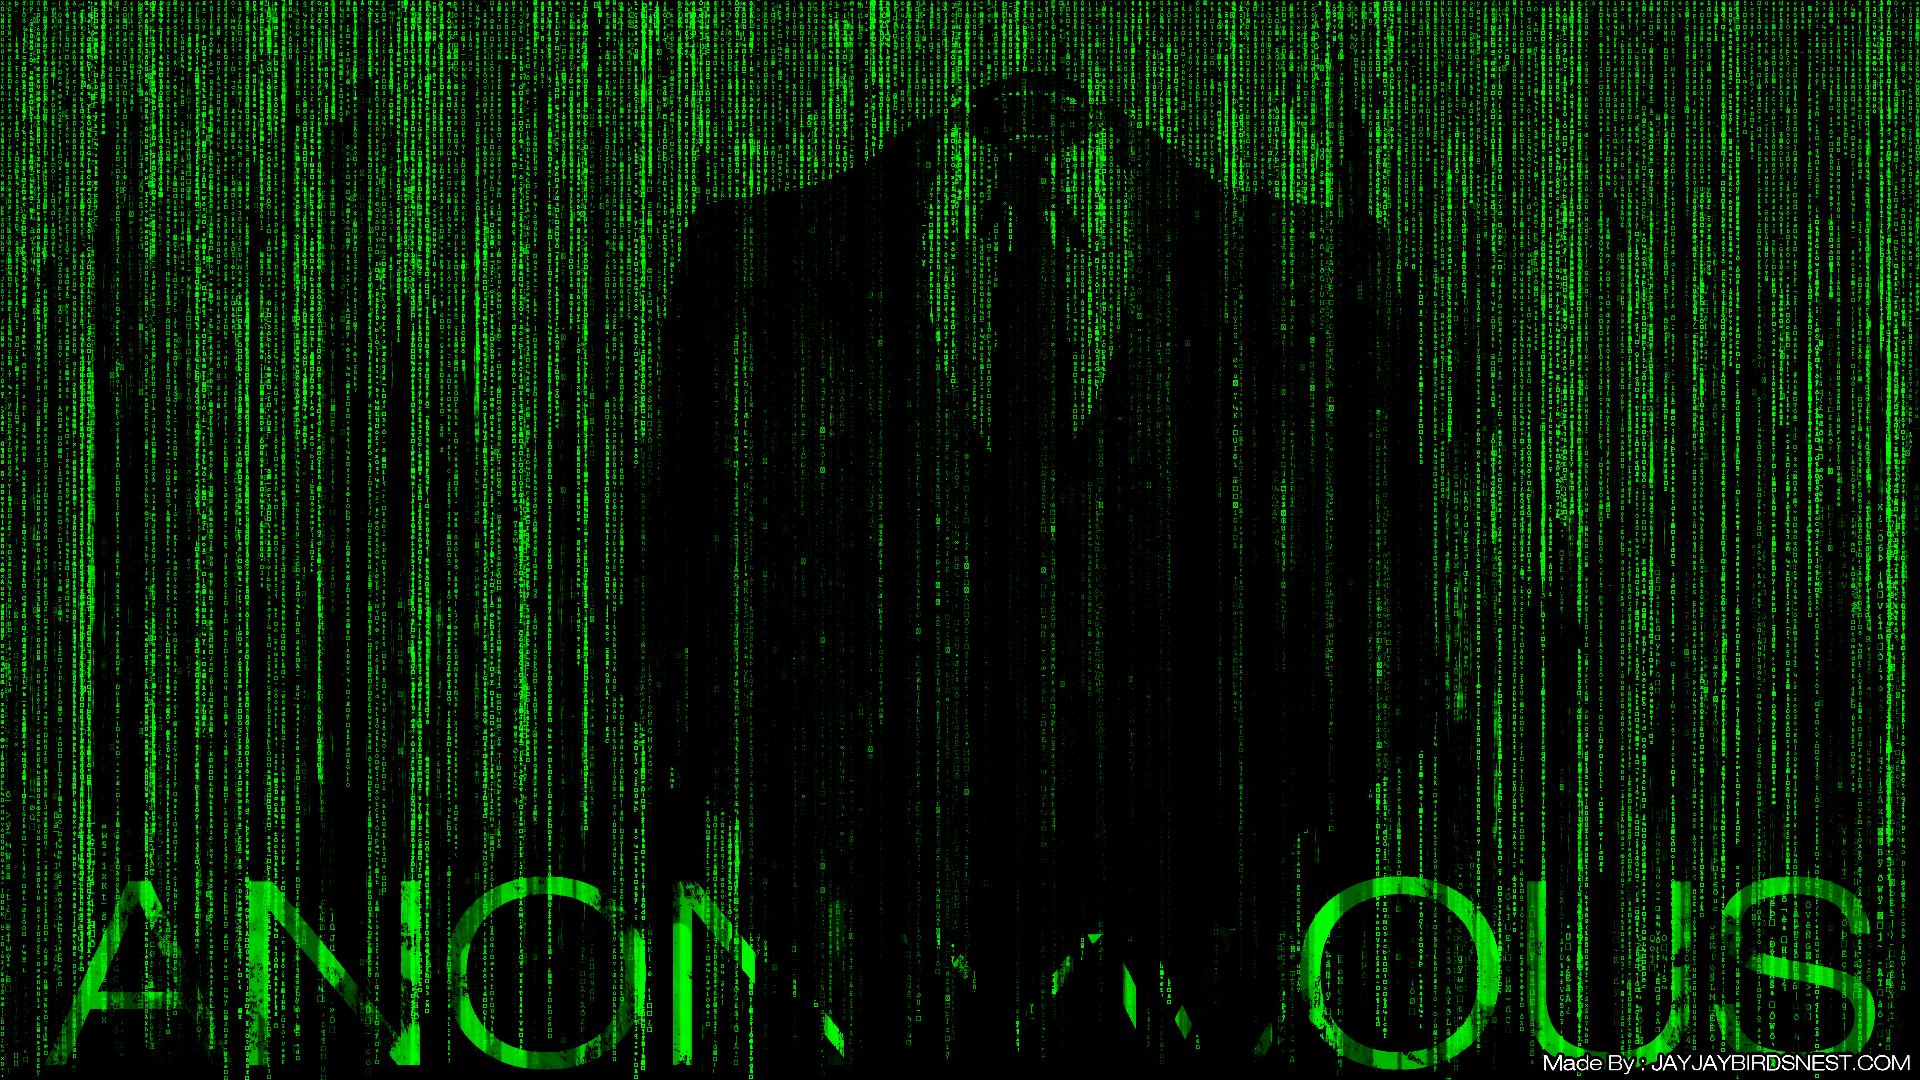 Anonymous Wallpaper by jayjaybirdsnest on DeviantArt